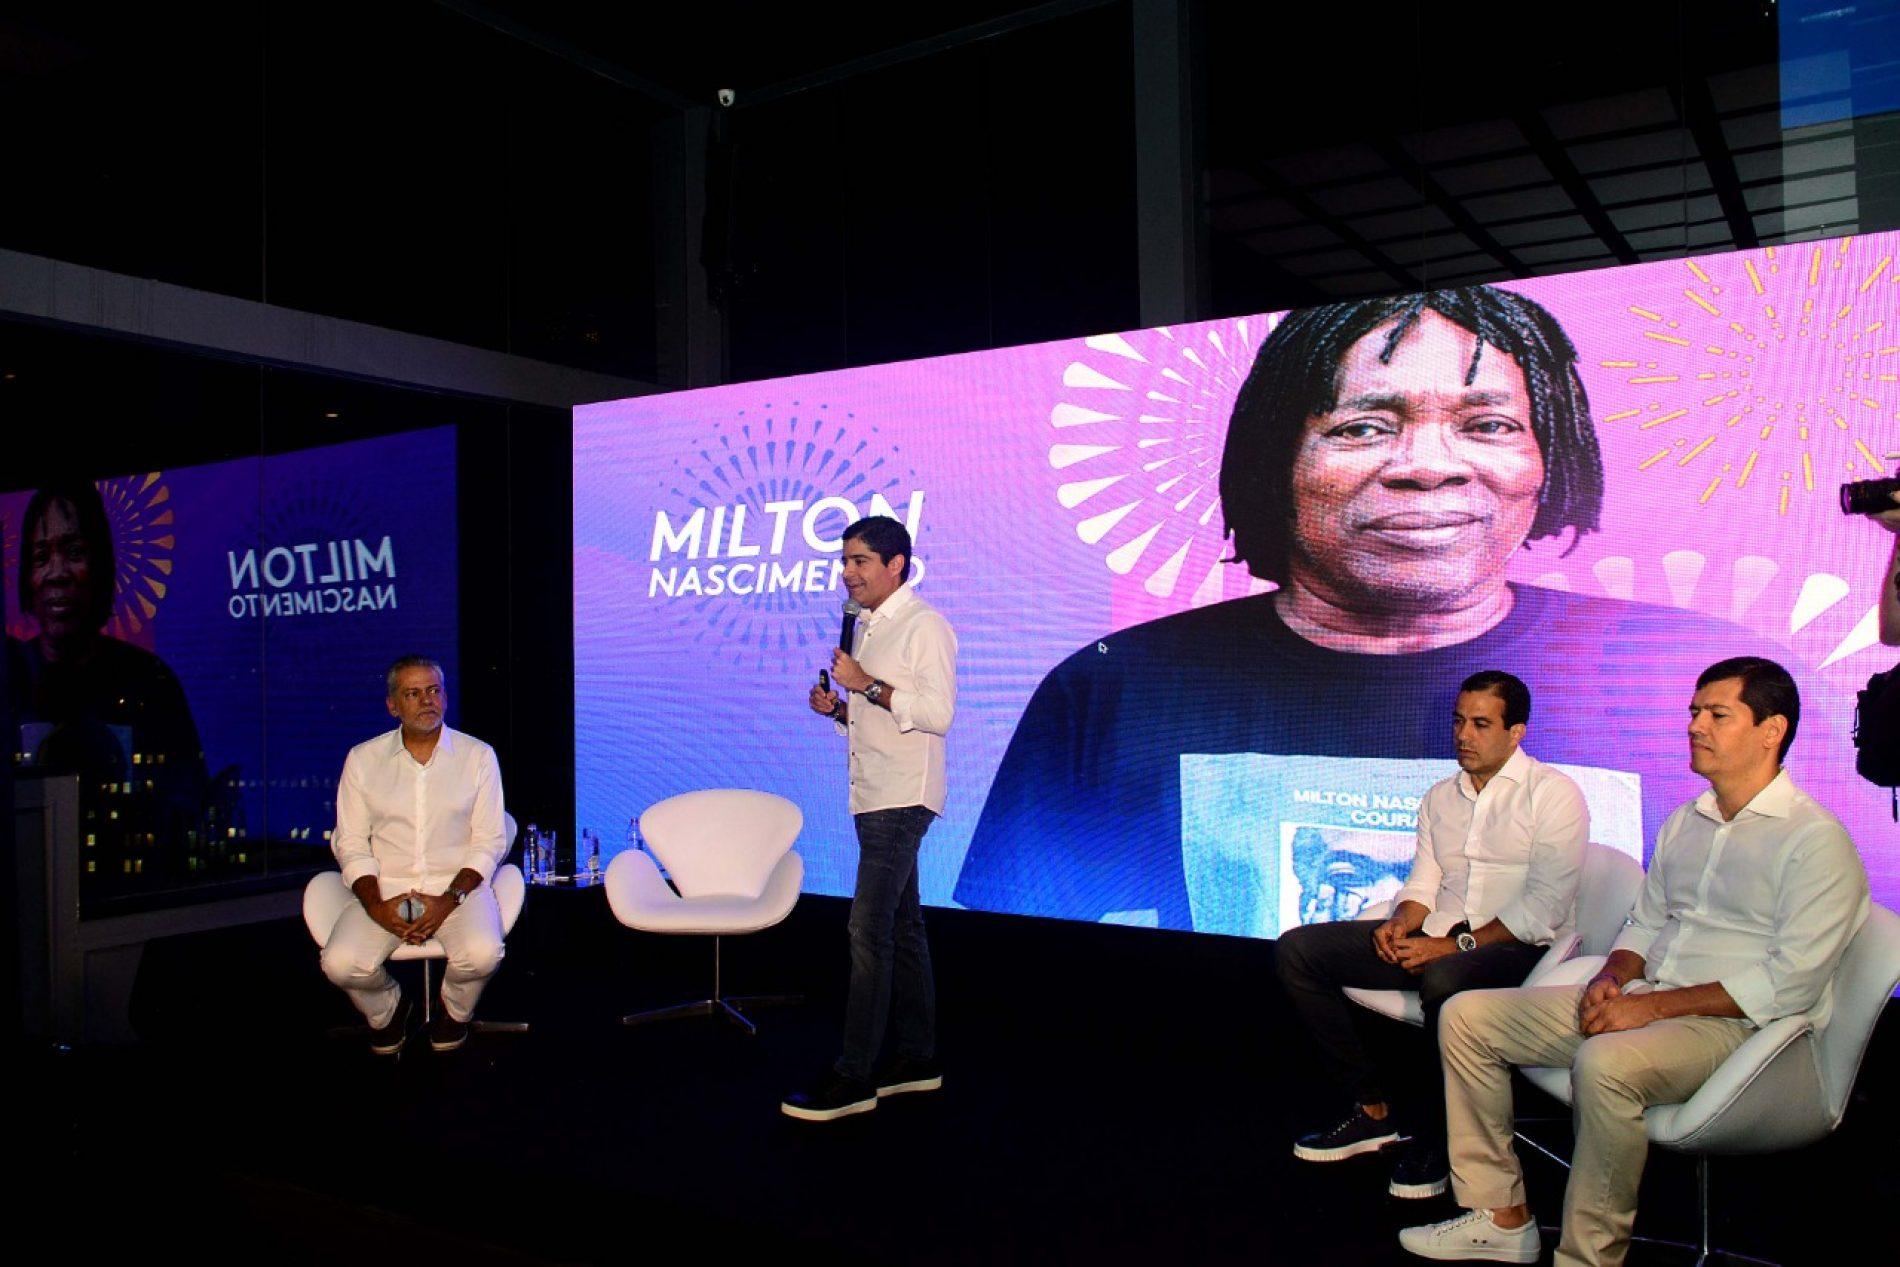 Salvador realiza o maior Réveillon do Brasil